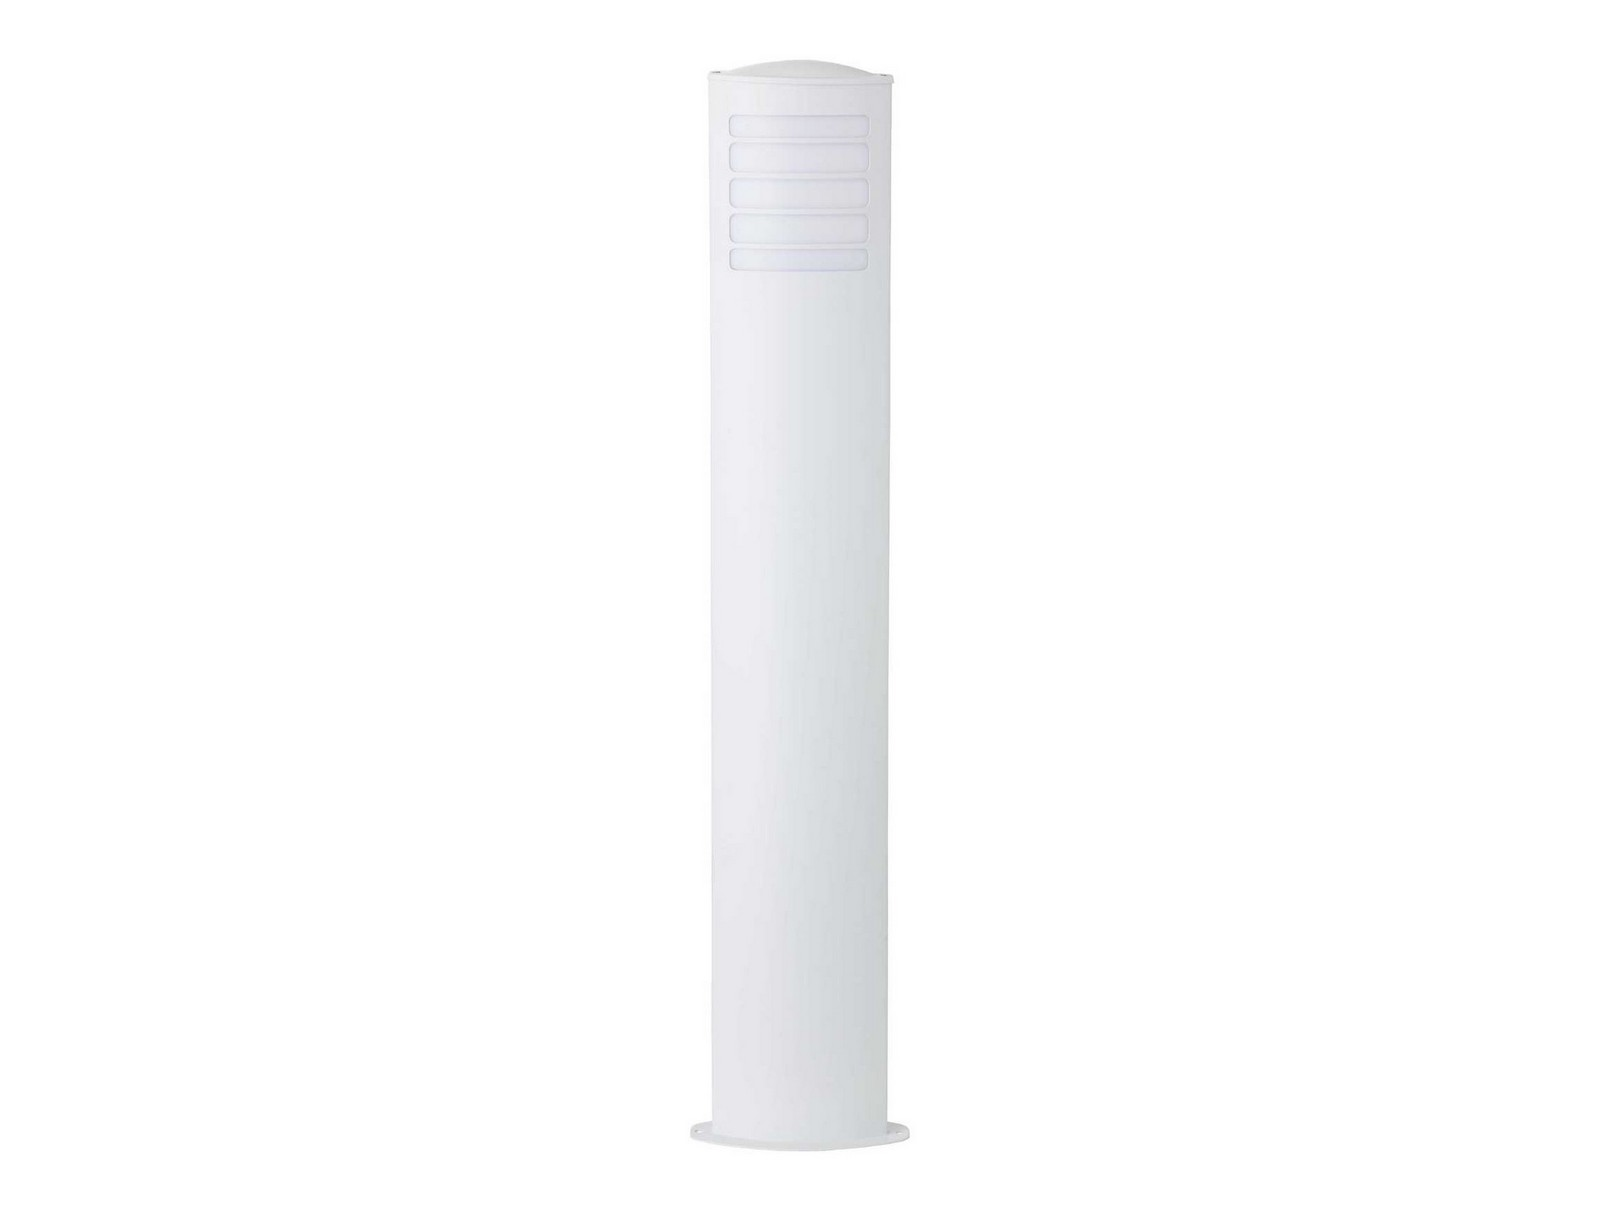 Светильник уличный ToddУличные наземные светильники<br>Вид цоколя: E27&amp;amp;nbsp;&amp;lt;div&amp;gt;Мощность ламп: 60W&amp;lt;br&amp;gt;&amp;lt;div&amp;gt;Количество ламп: 1&amp;amp;nbsp;&amp;lt;/div&amp;gt;&amp;lt;div&amp;gt;Наличие ламп: отсутствуют&amp;lt;/div&amp;gt;&amp;lt;/div&amp;gt;<br><br>Material: Пластик<br>Ширина см: 7<br>Высота см: 100<br>Глубина см: 16